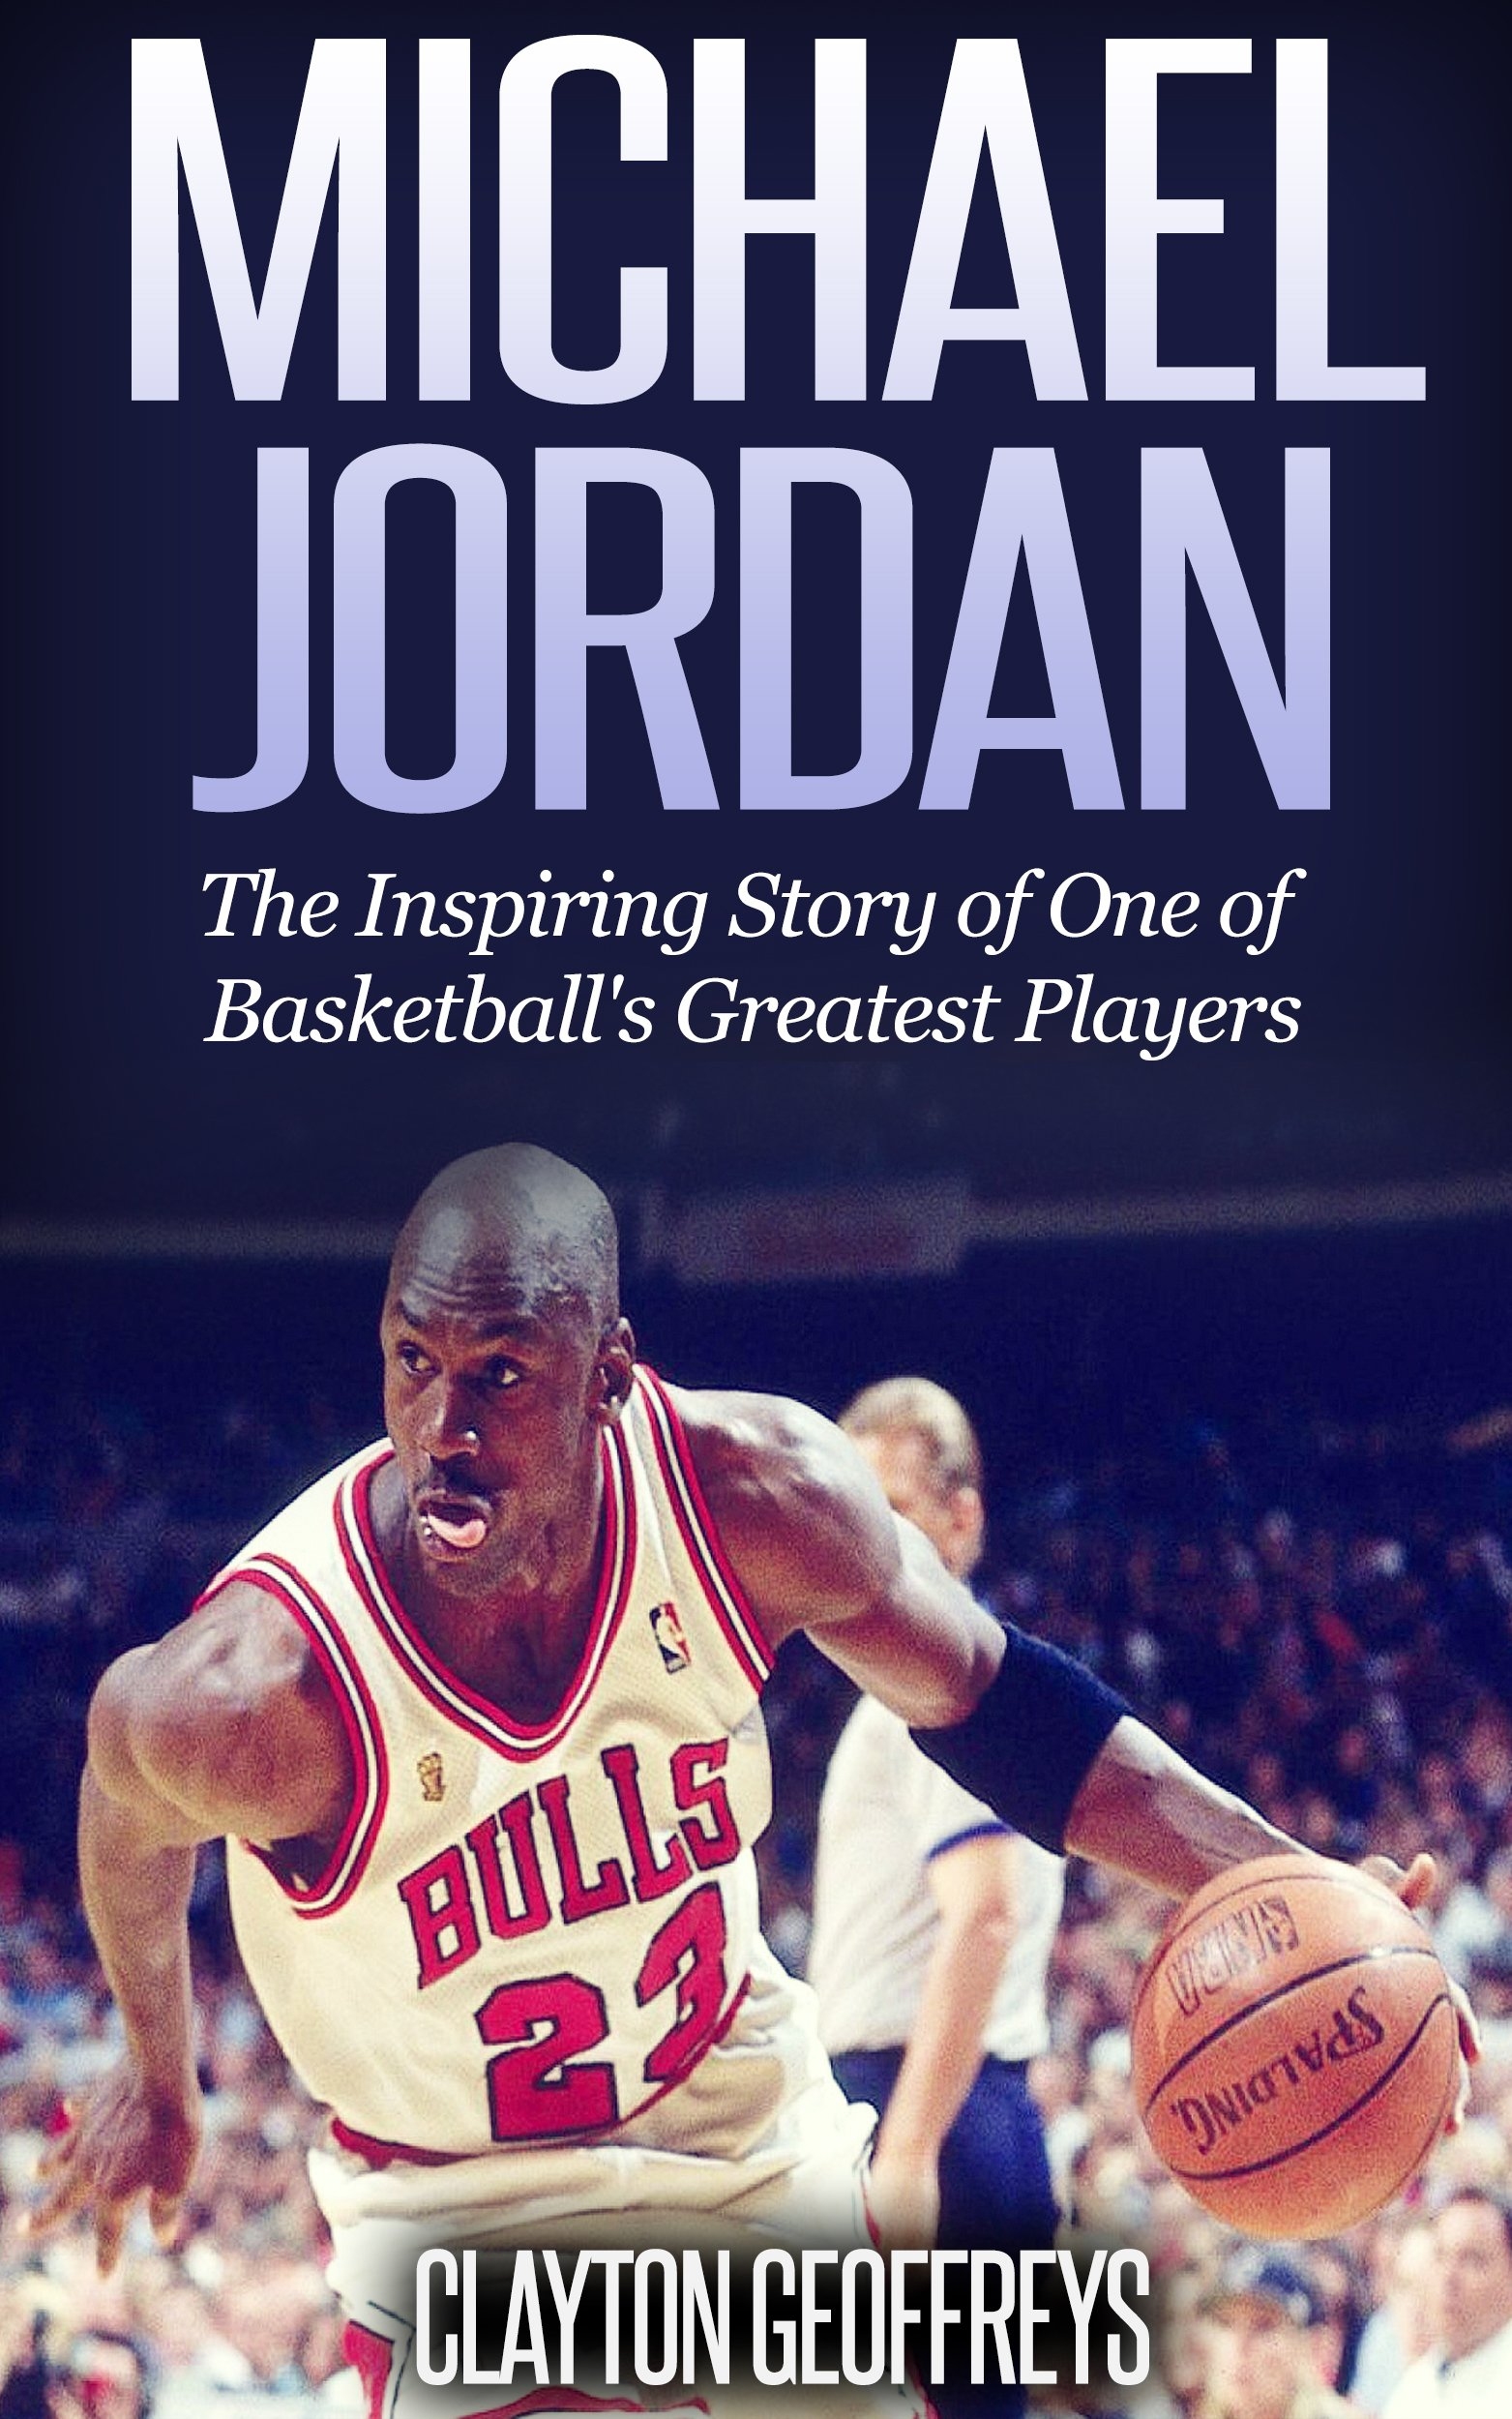 Michael Jordan: The Inspiring Story of One of Basketball's Greatest Players (Basketball Biography Books) (English Edition)